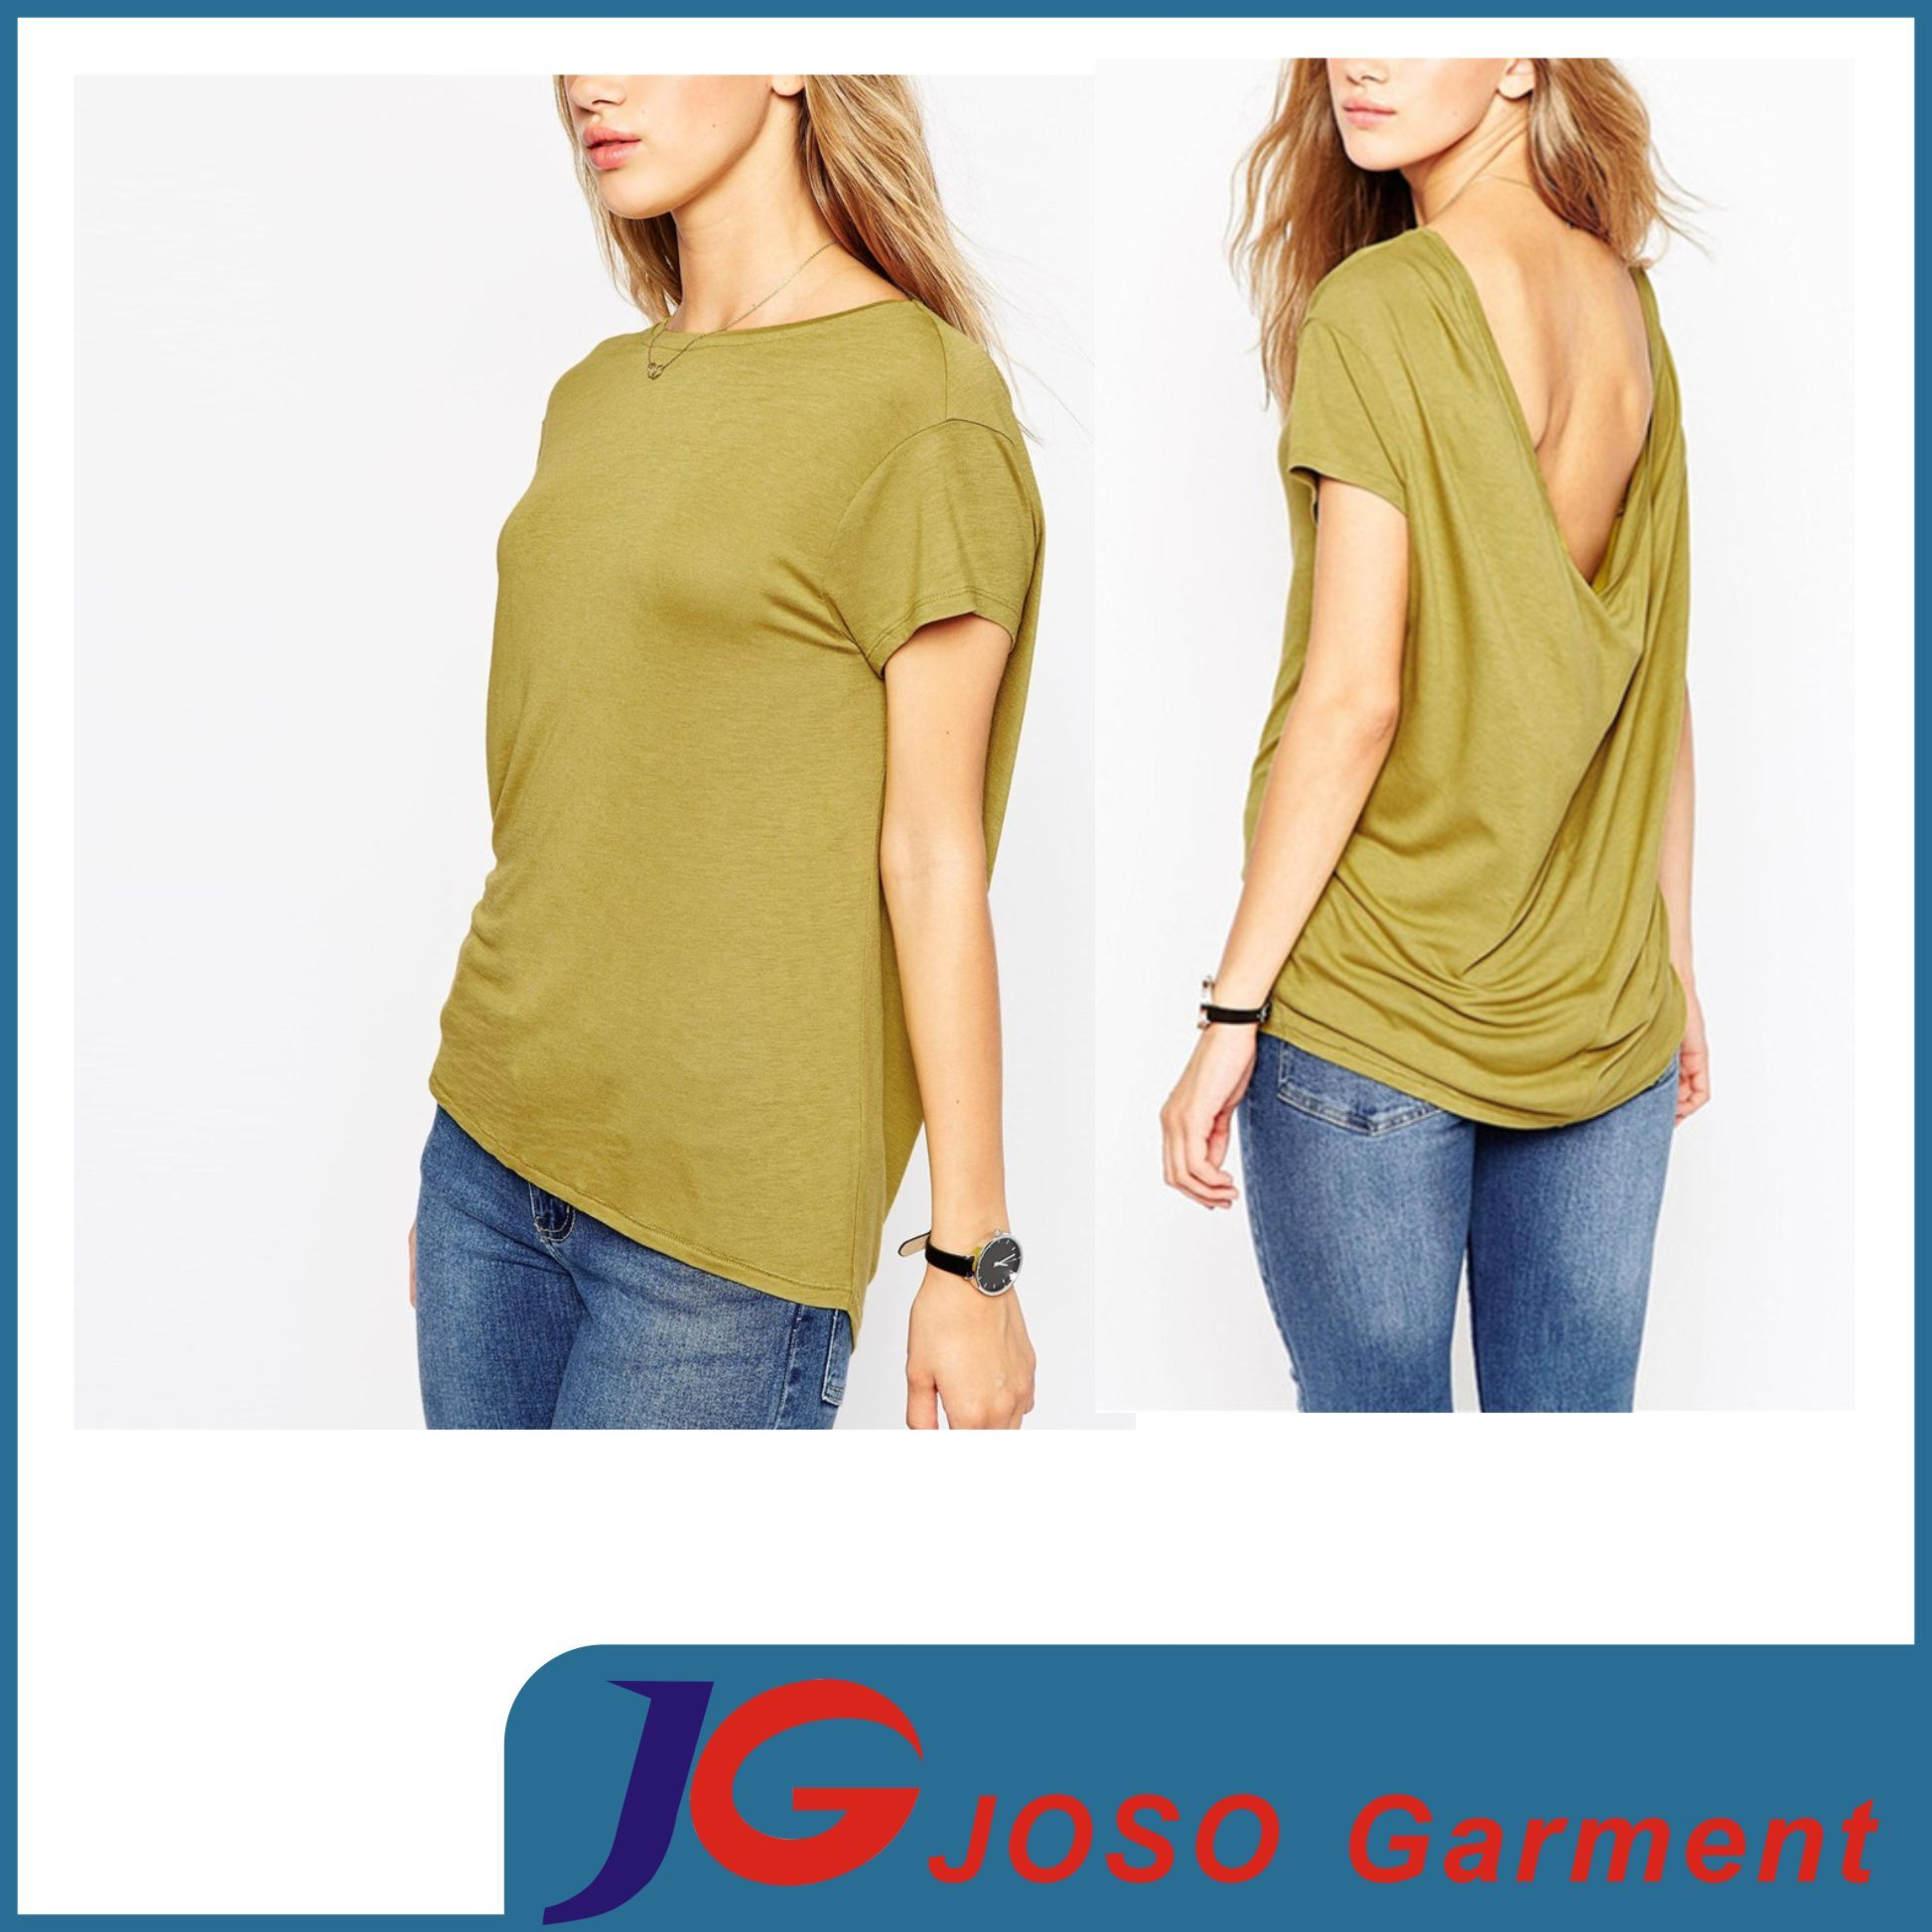 China Crop Tee Shirt Top Blouse Designs For Women Js9022 China